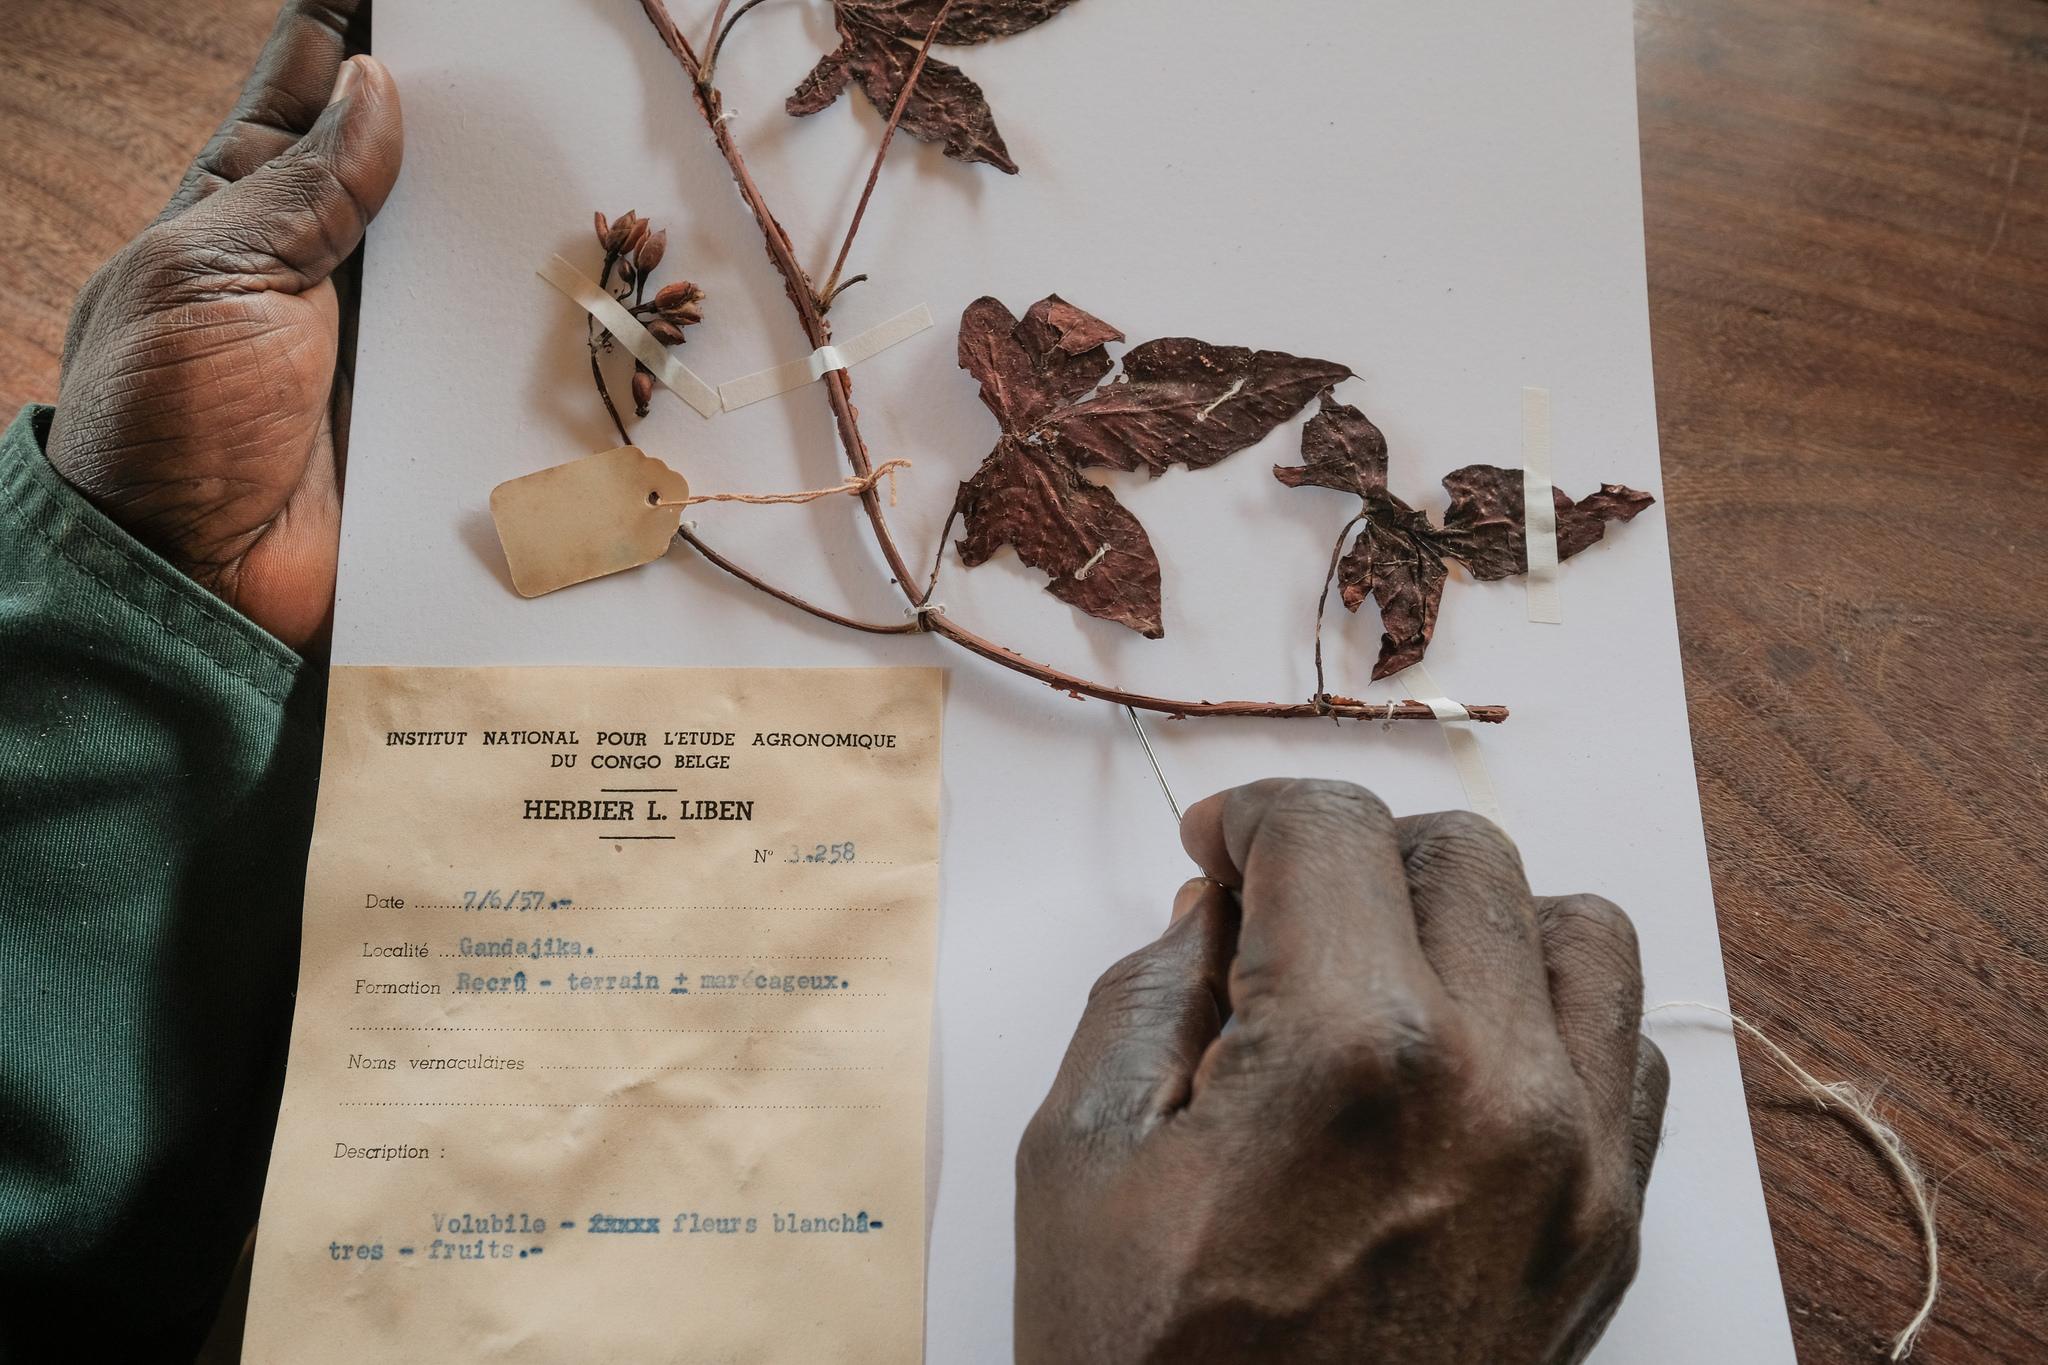 Protecting Congo's botanical treasures